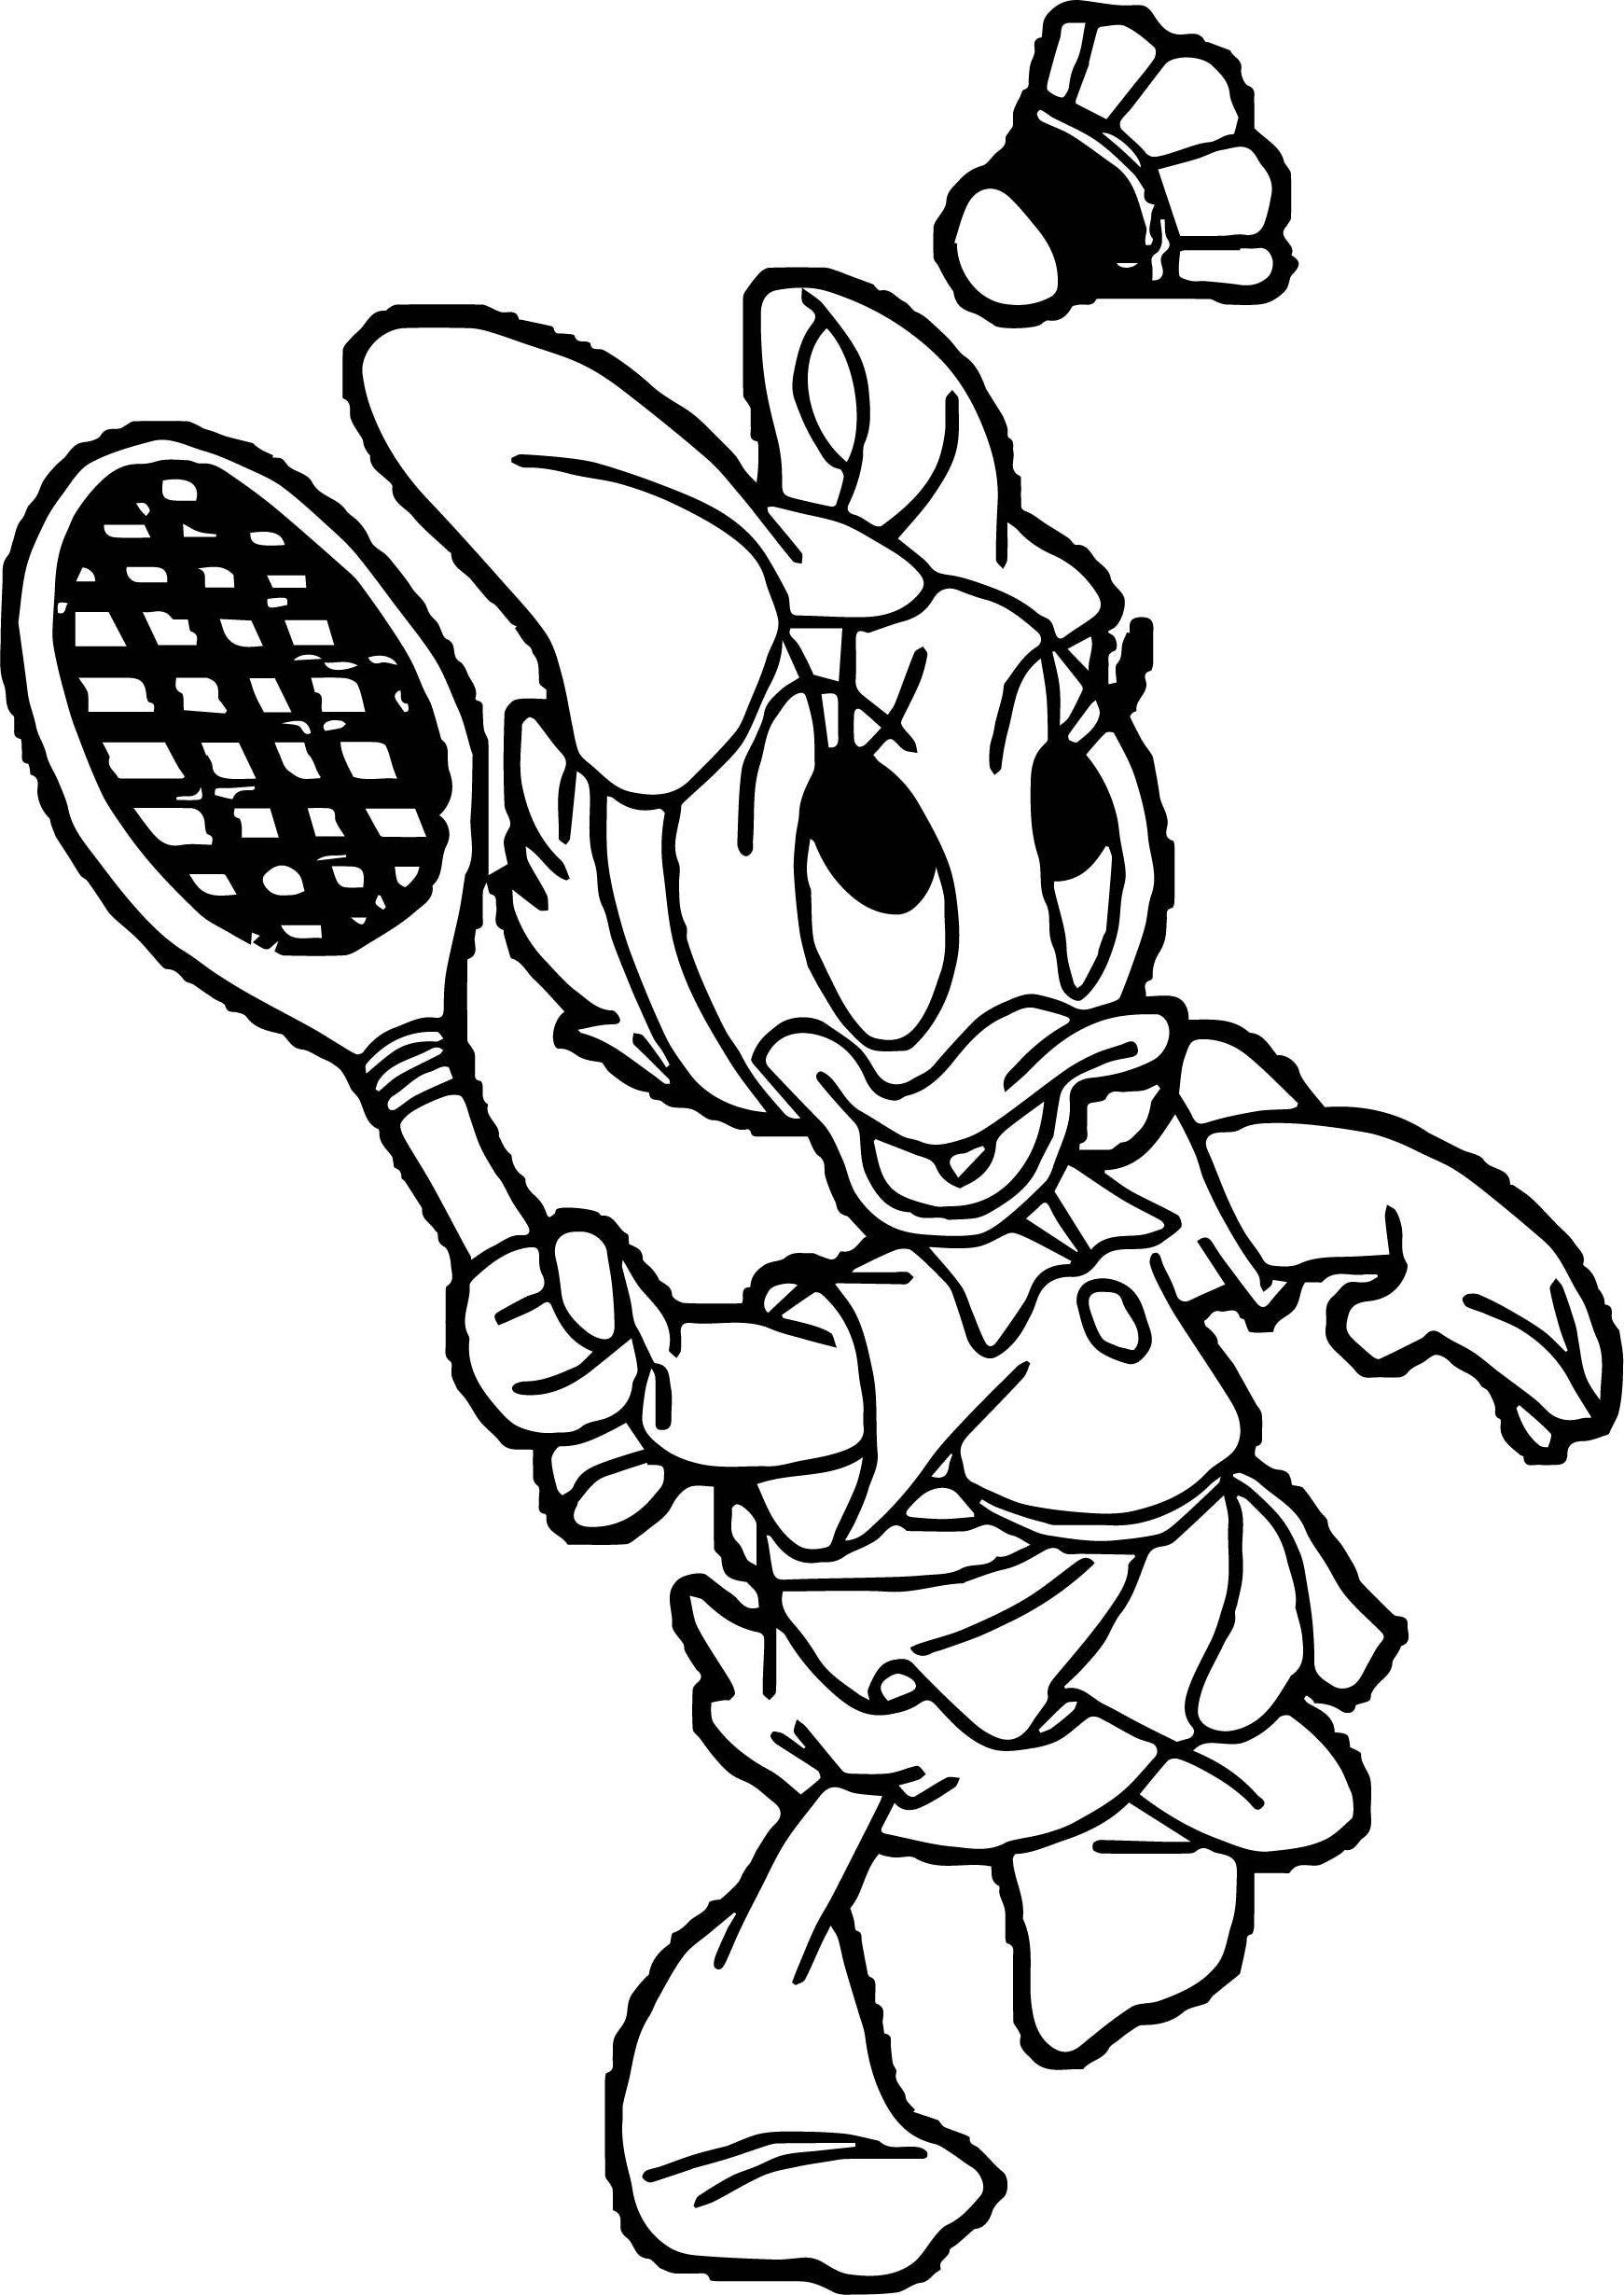 Badminton Schläger Ausmalbilder - Ultra Coloring Pages | 2460x1741